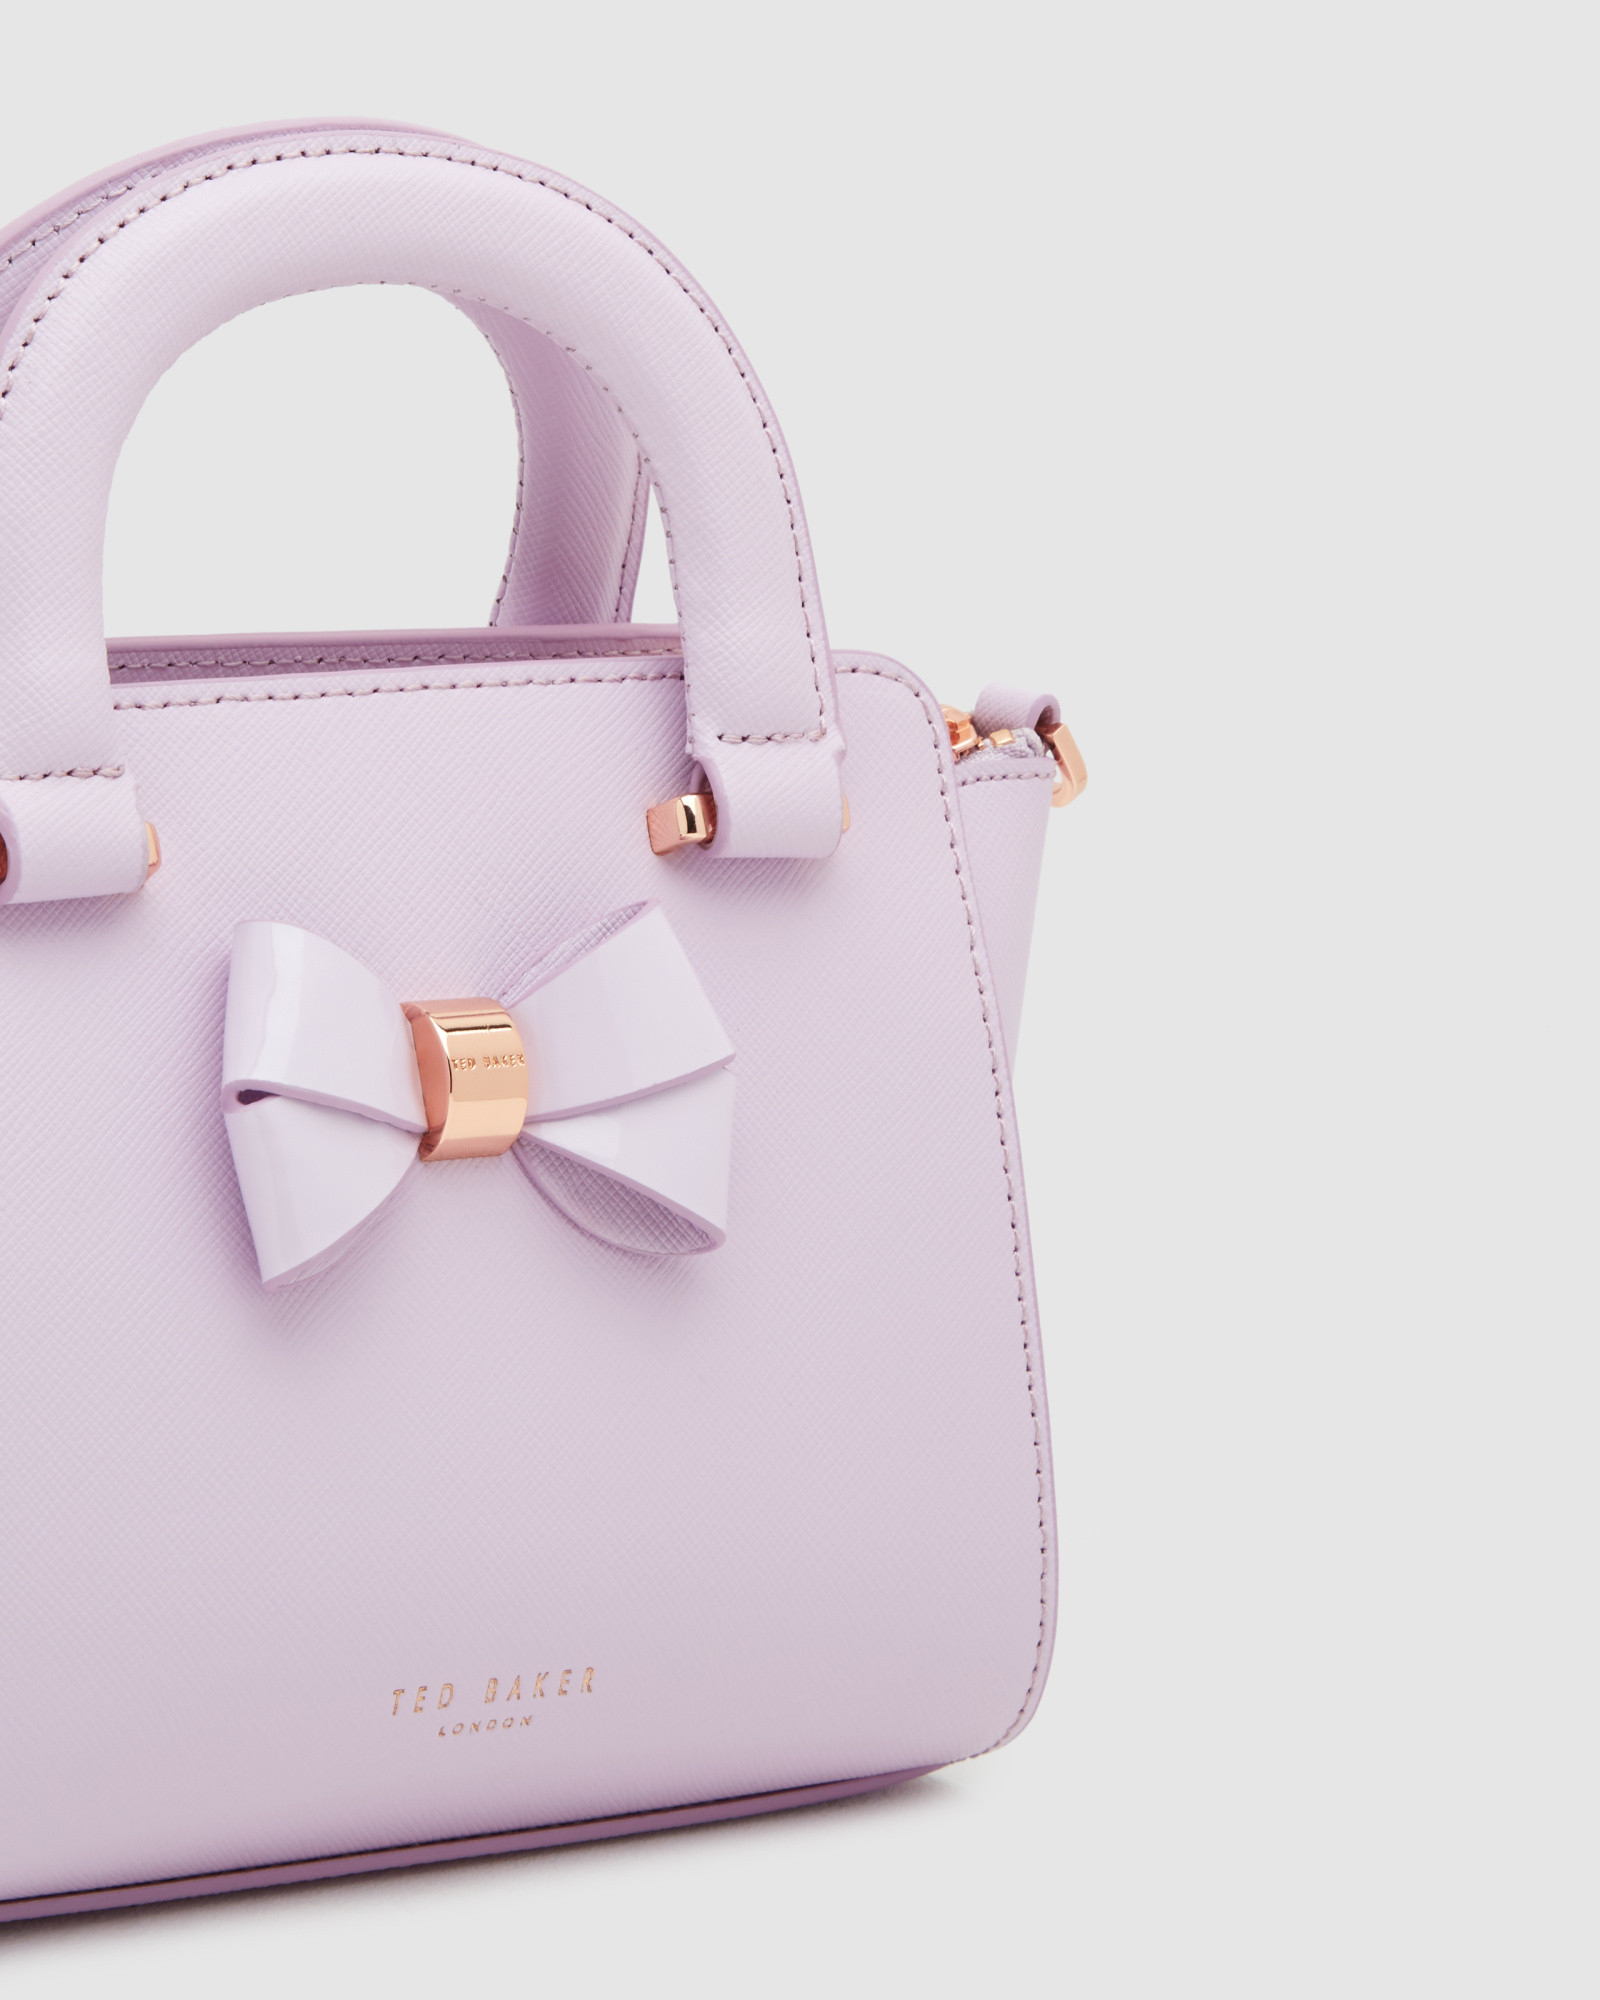 945215cbe Lyst - Ted Baker Mini Bow Crosshatch Leather Shopper Bag in Purple